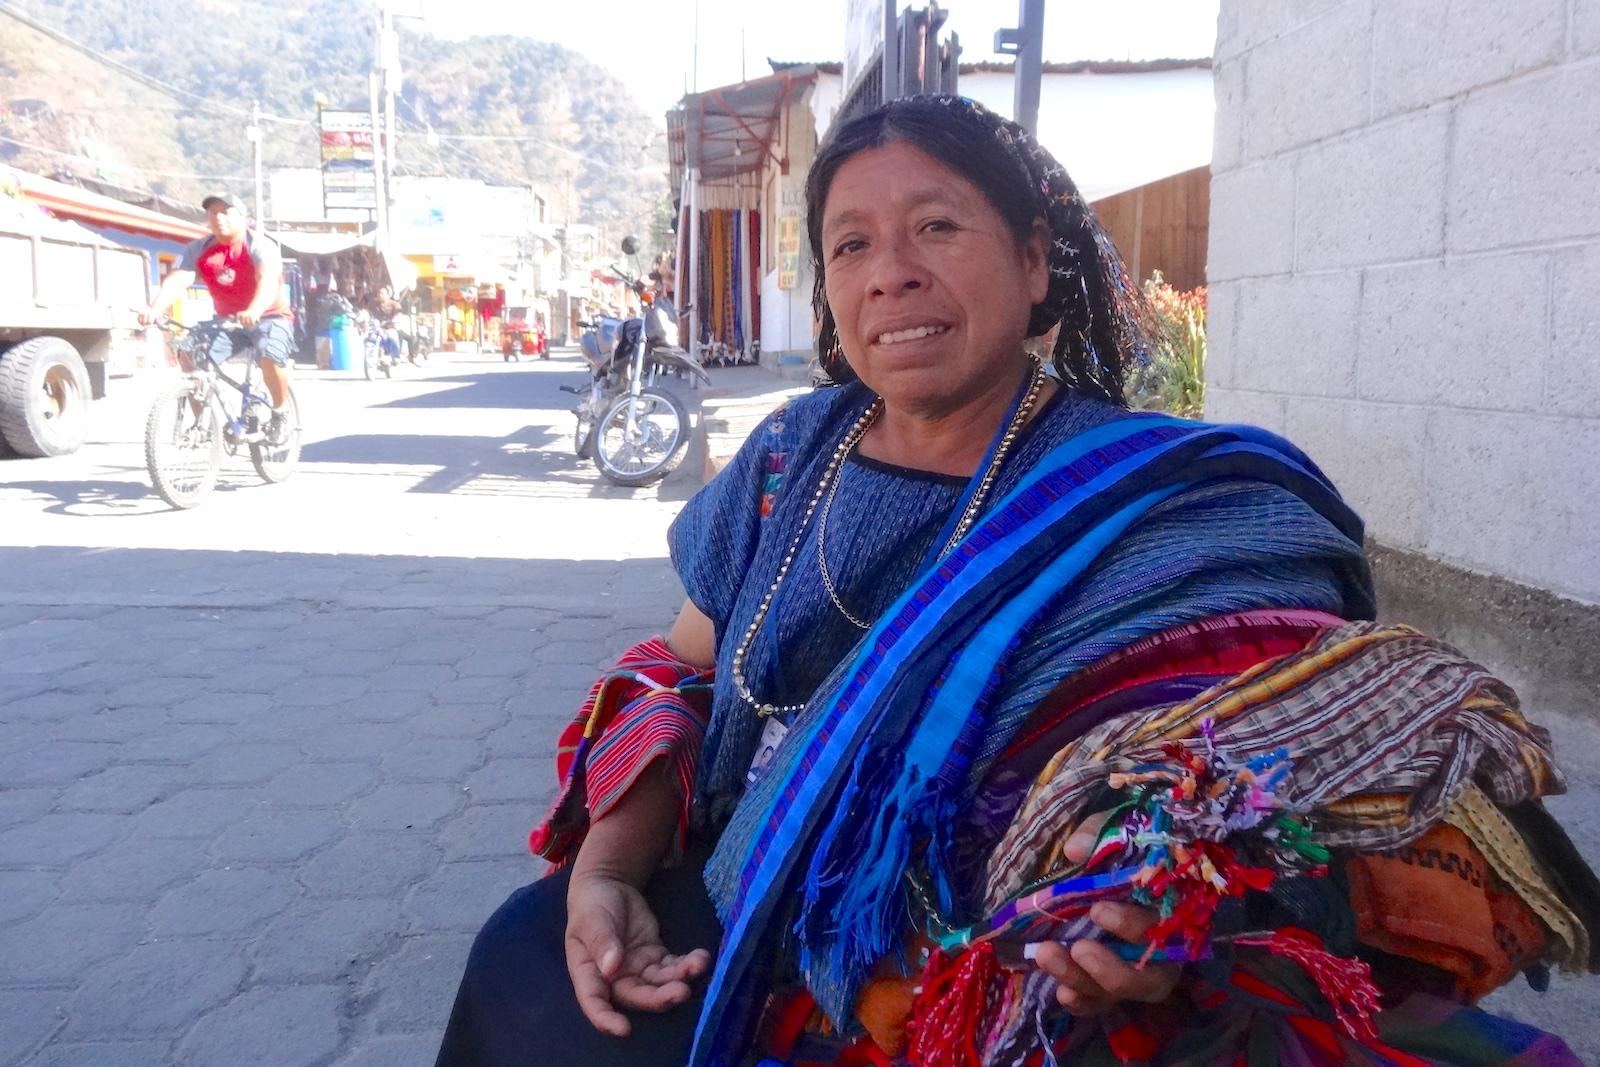 Craigslist in guatemala